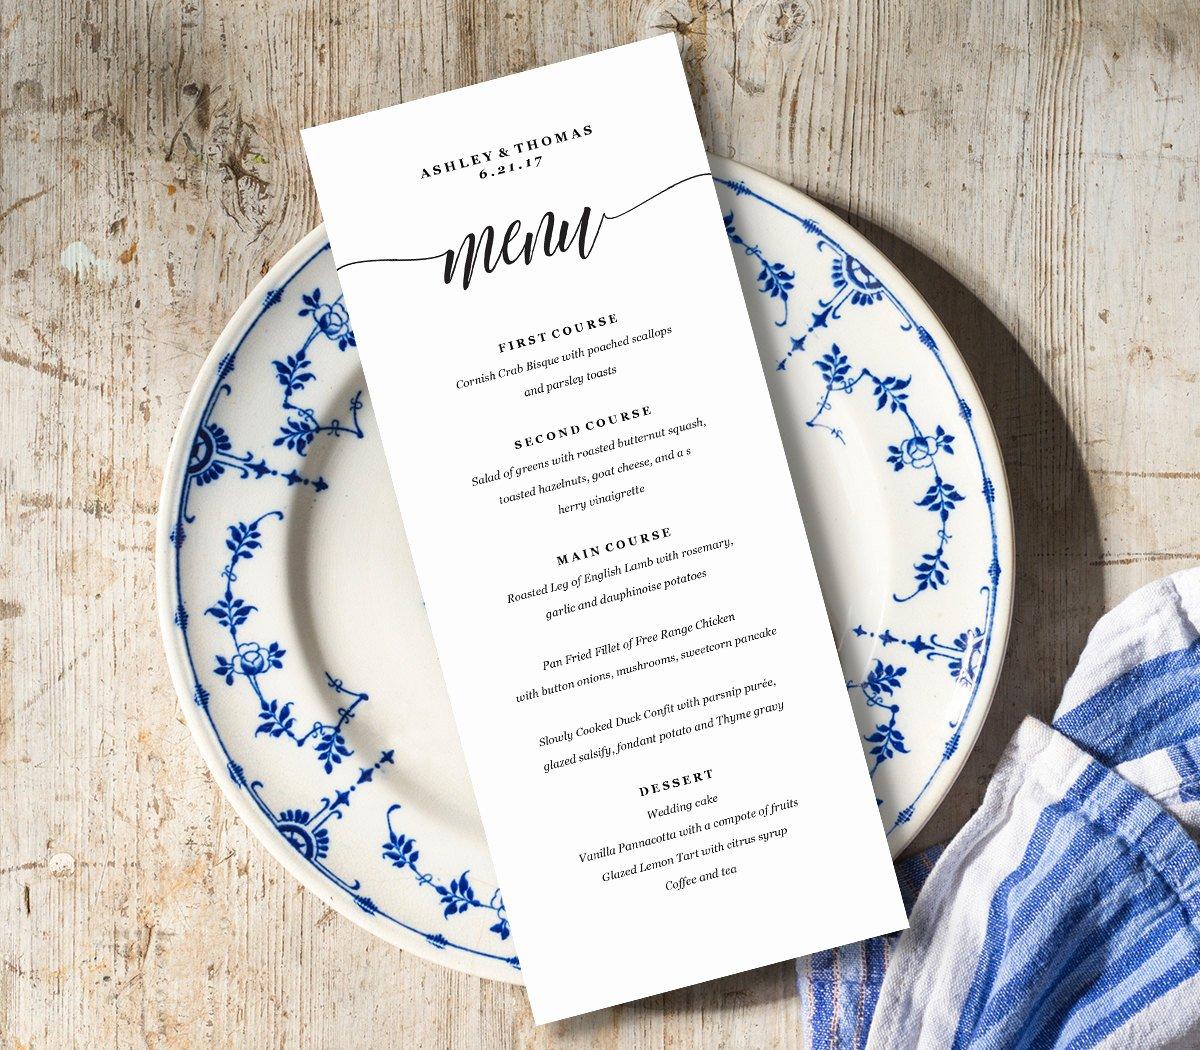 Free Menu Card Template Luxury Menu Card Template Rustic Dinner Menu Wedding Menu Card